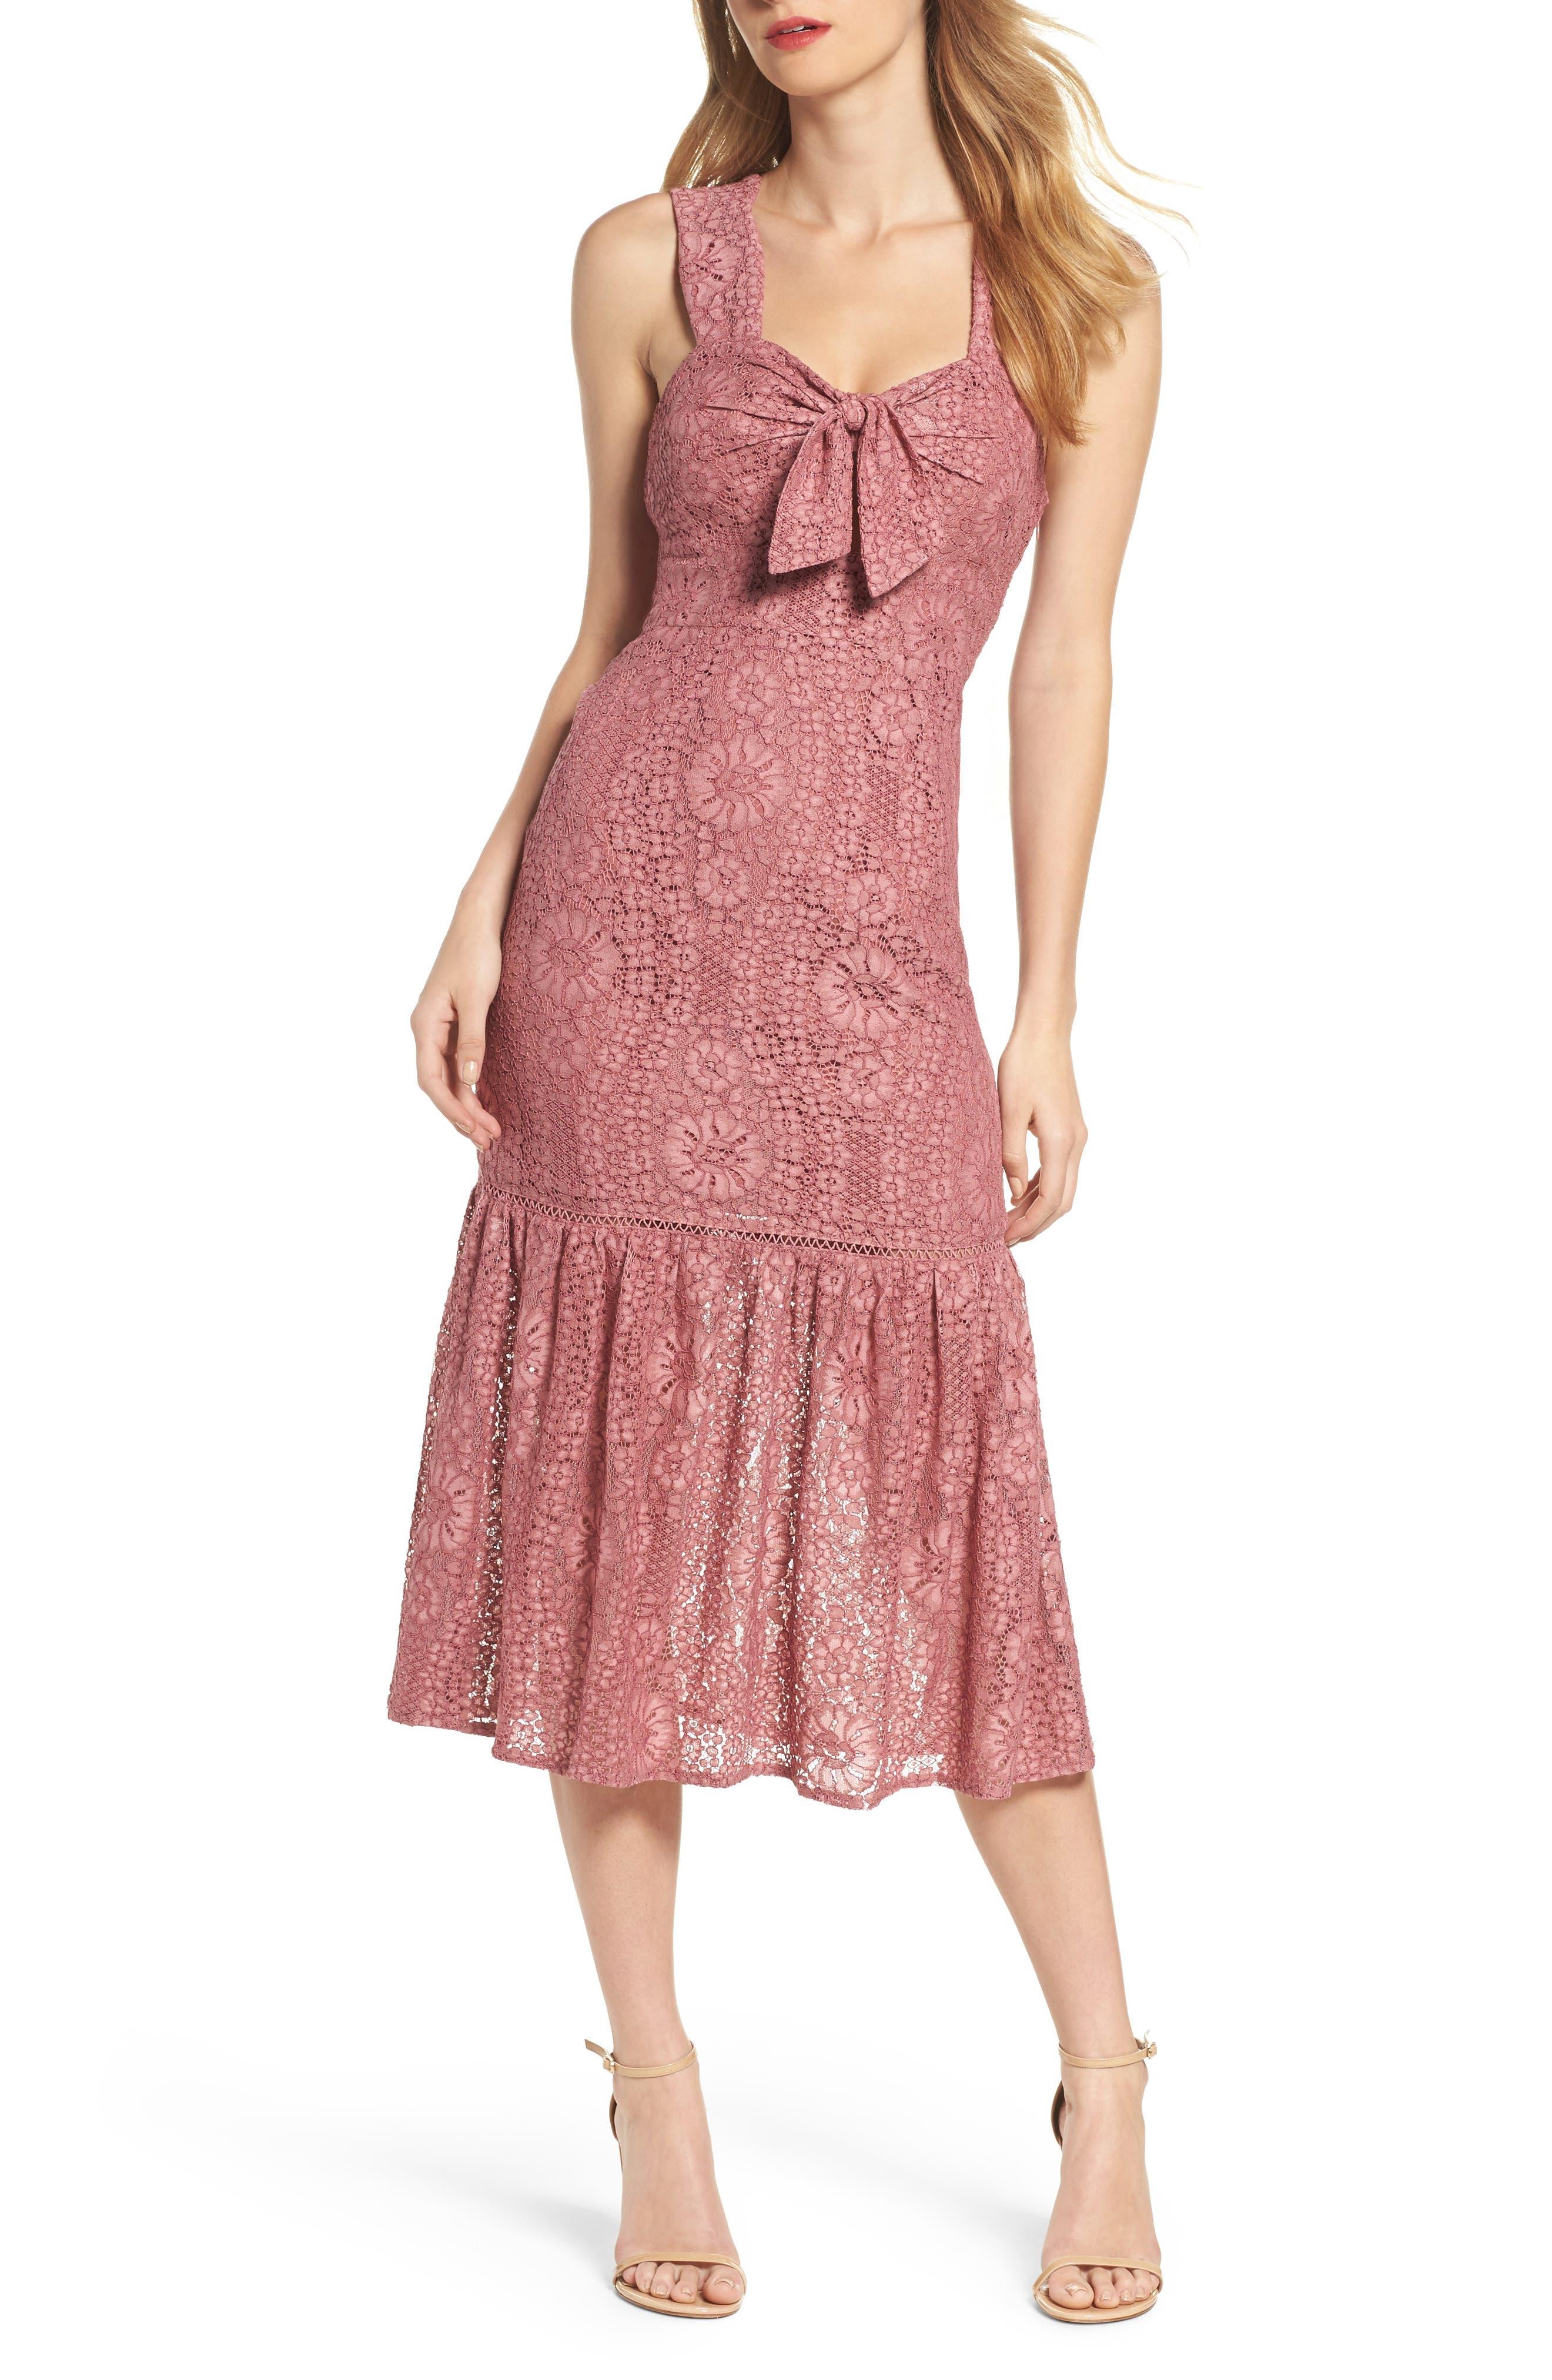 Main Image - Foxiedox Emilia Lace Peplum Midi Dress